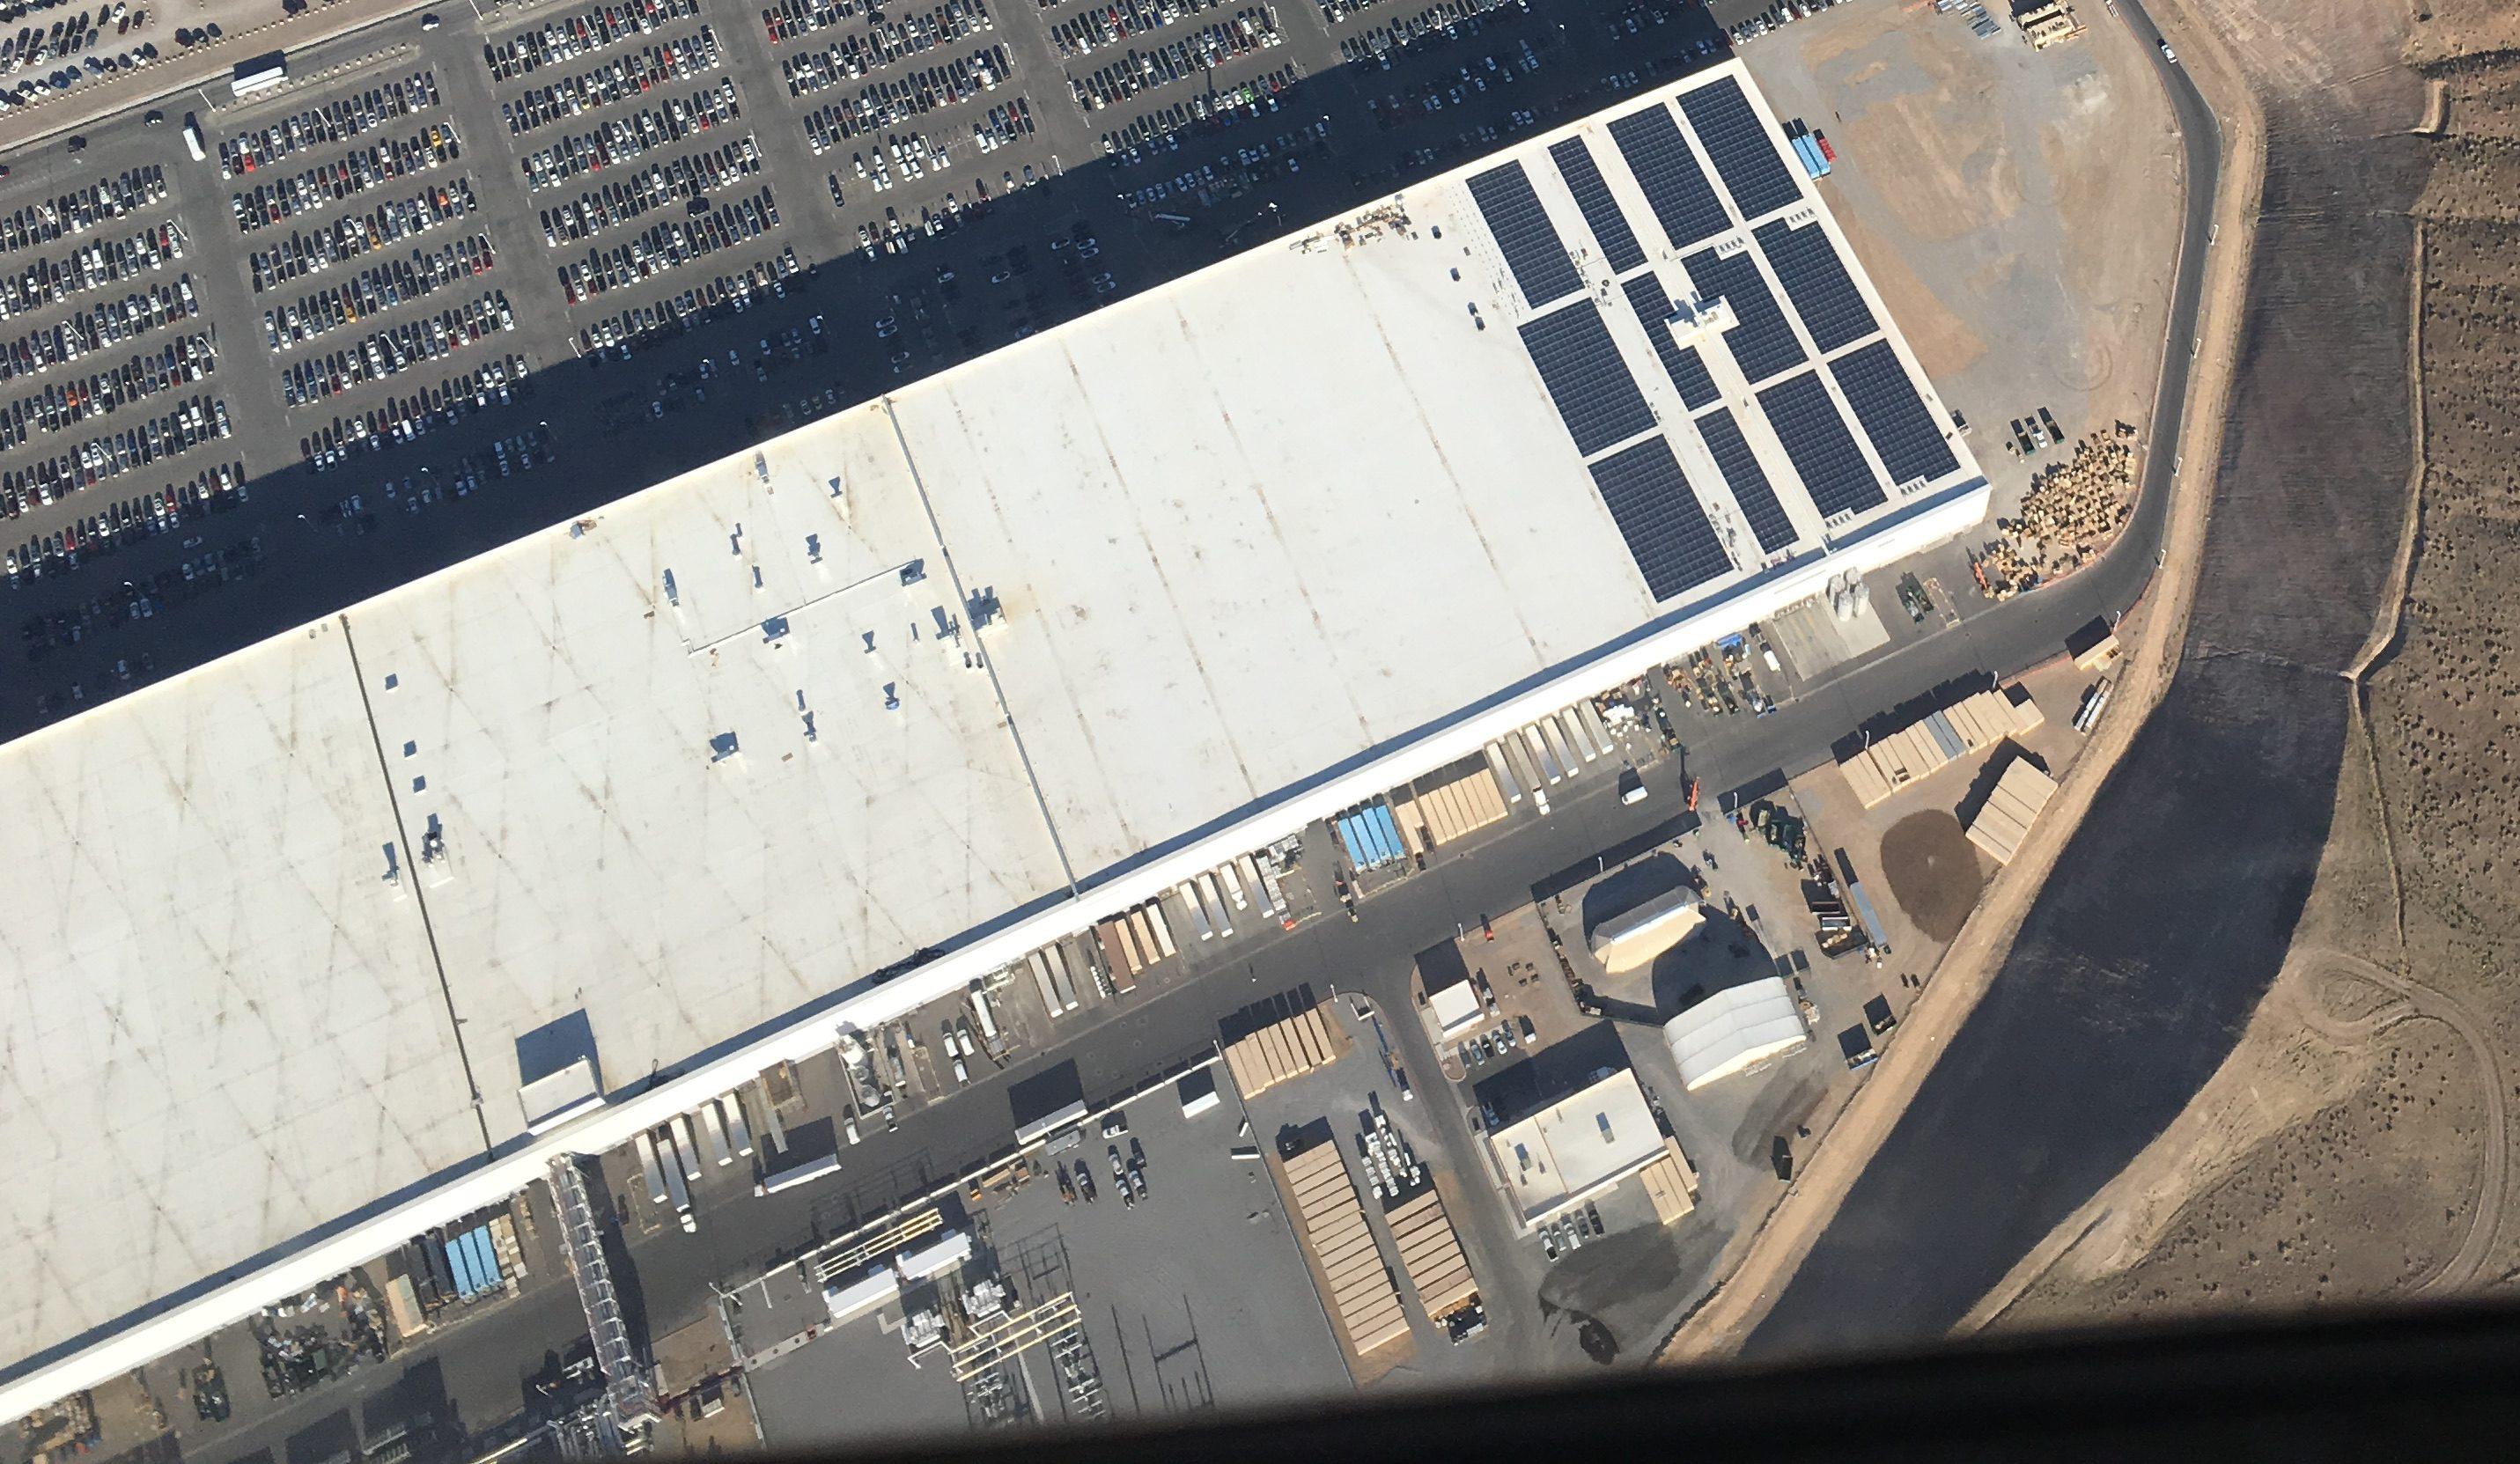 tesla-gigafactory-solar-array-aug-29